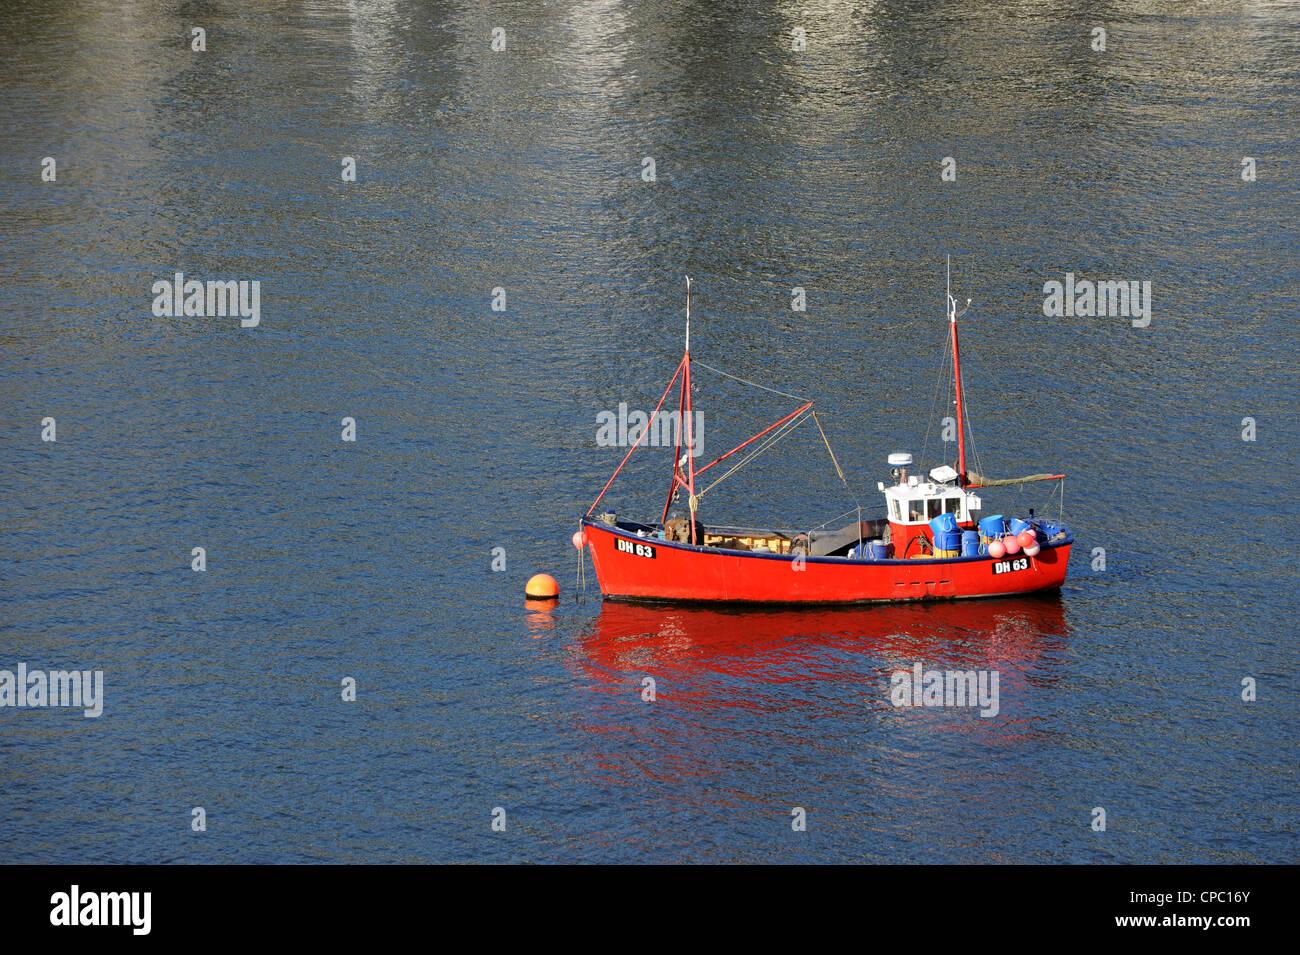 Roten Fischerboot vor Anker am Fluss Dart in Dartmouth Stockbild